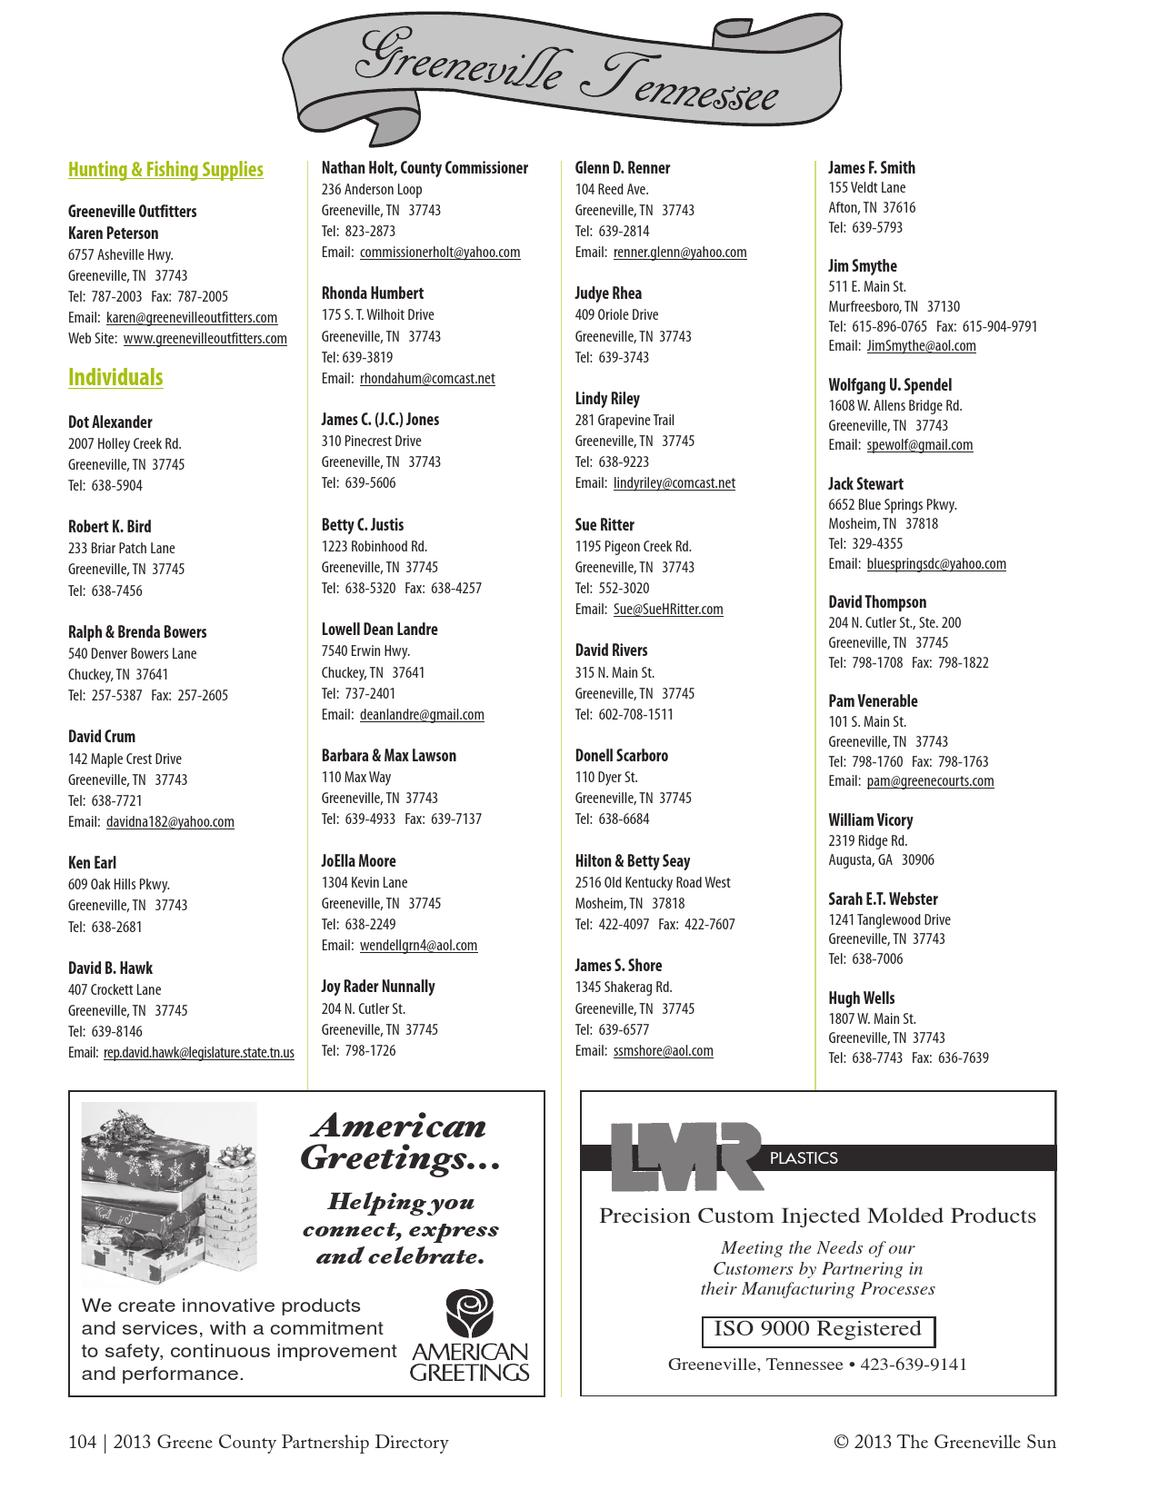 Gcpdirectory2013 by the greeneville sun issuu m4hsunfo